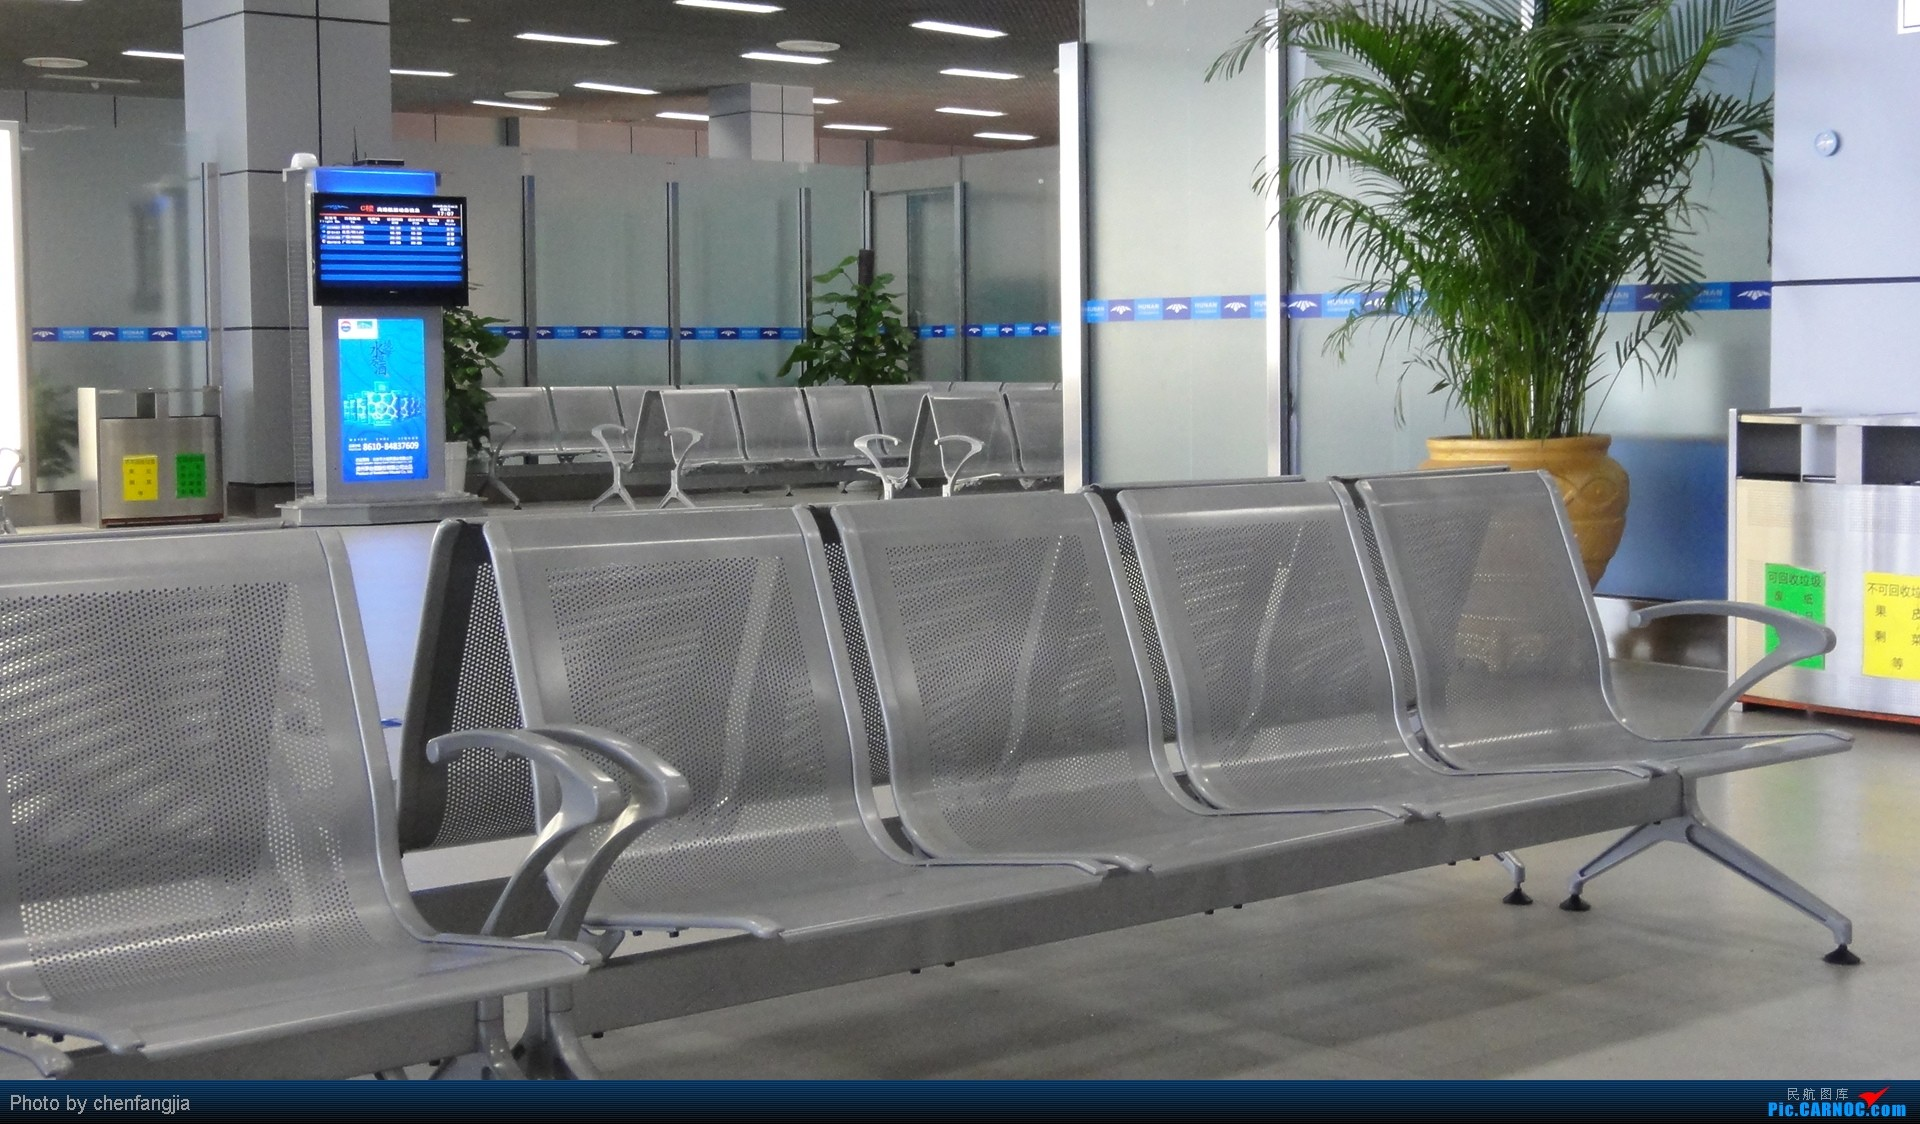 Re:[原创]新手发帖,多多支持!CSX-KMG  CZ3467  ---------标题要长---    中国长沙黄花机场